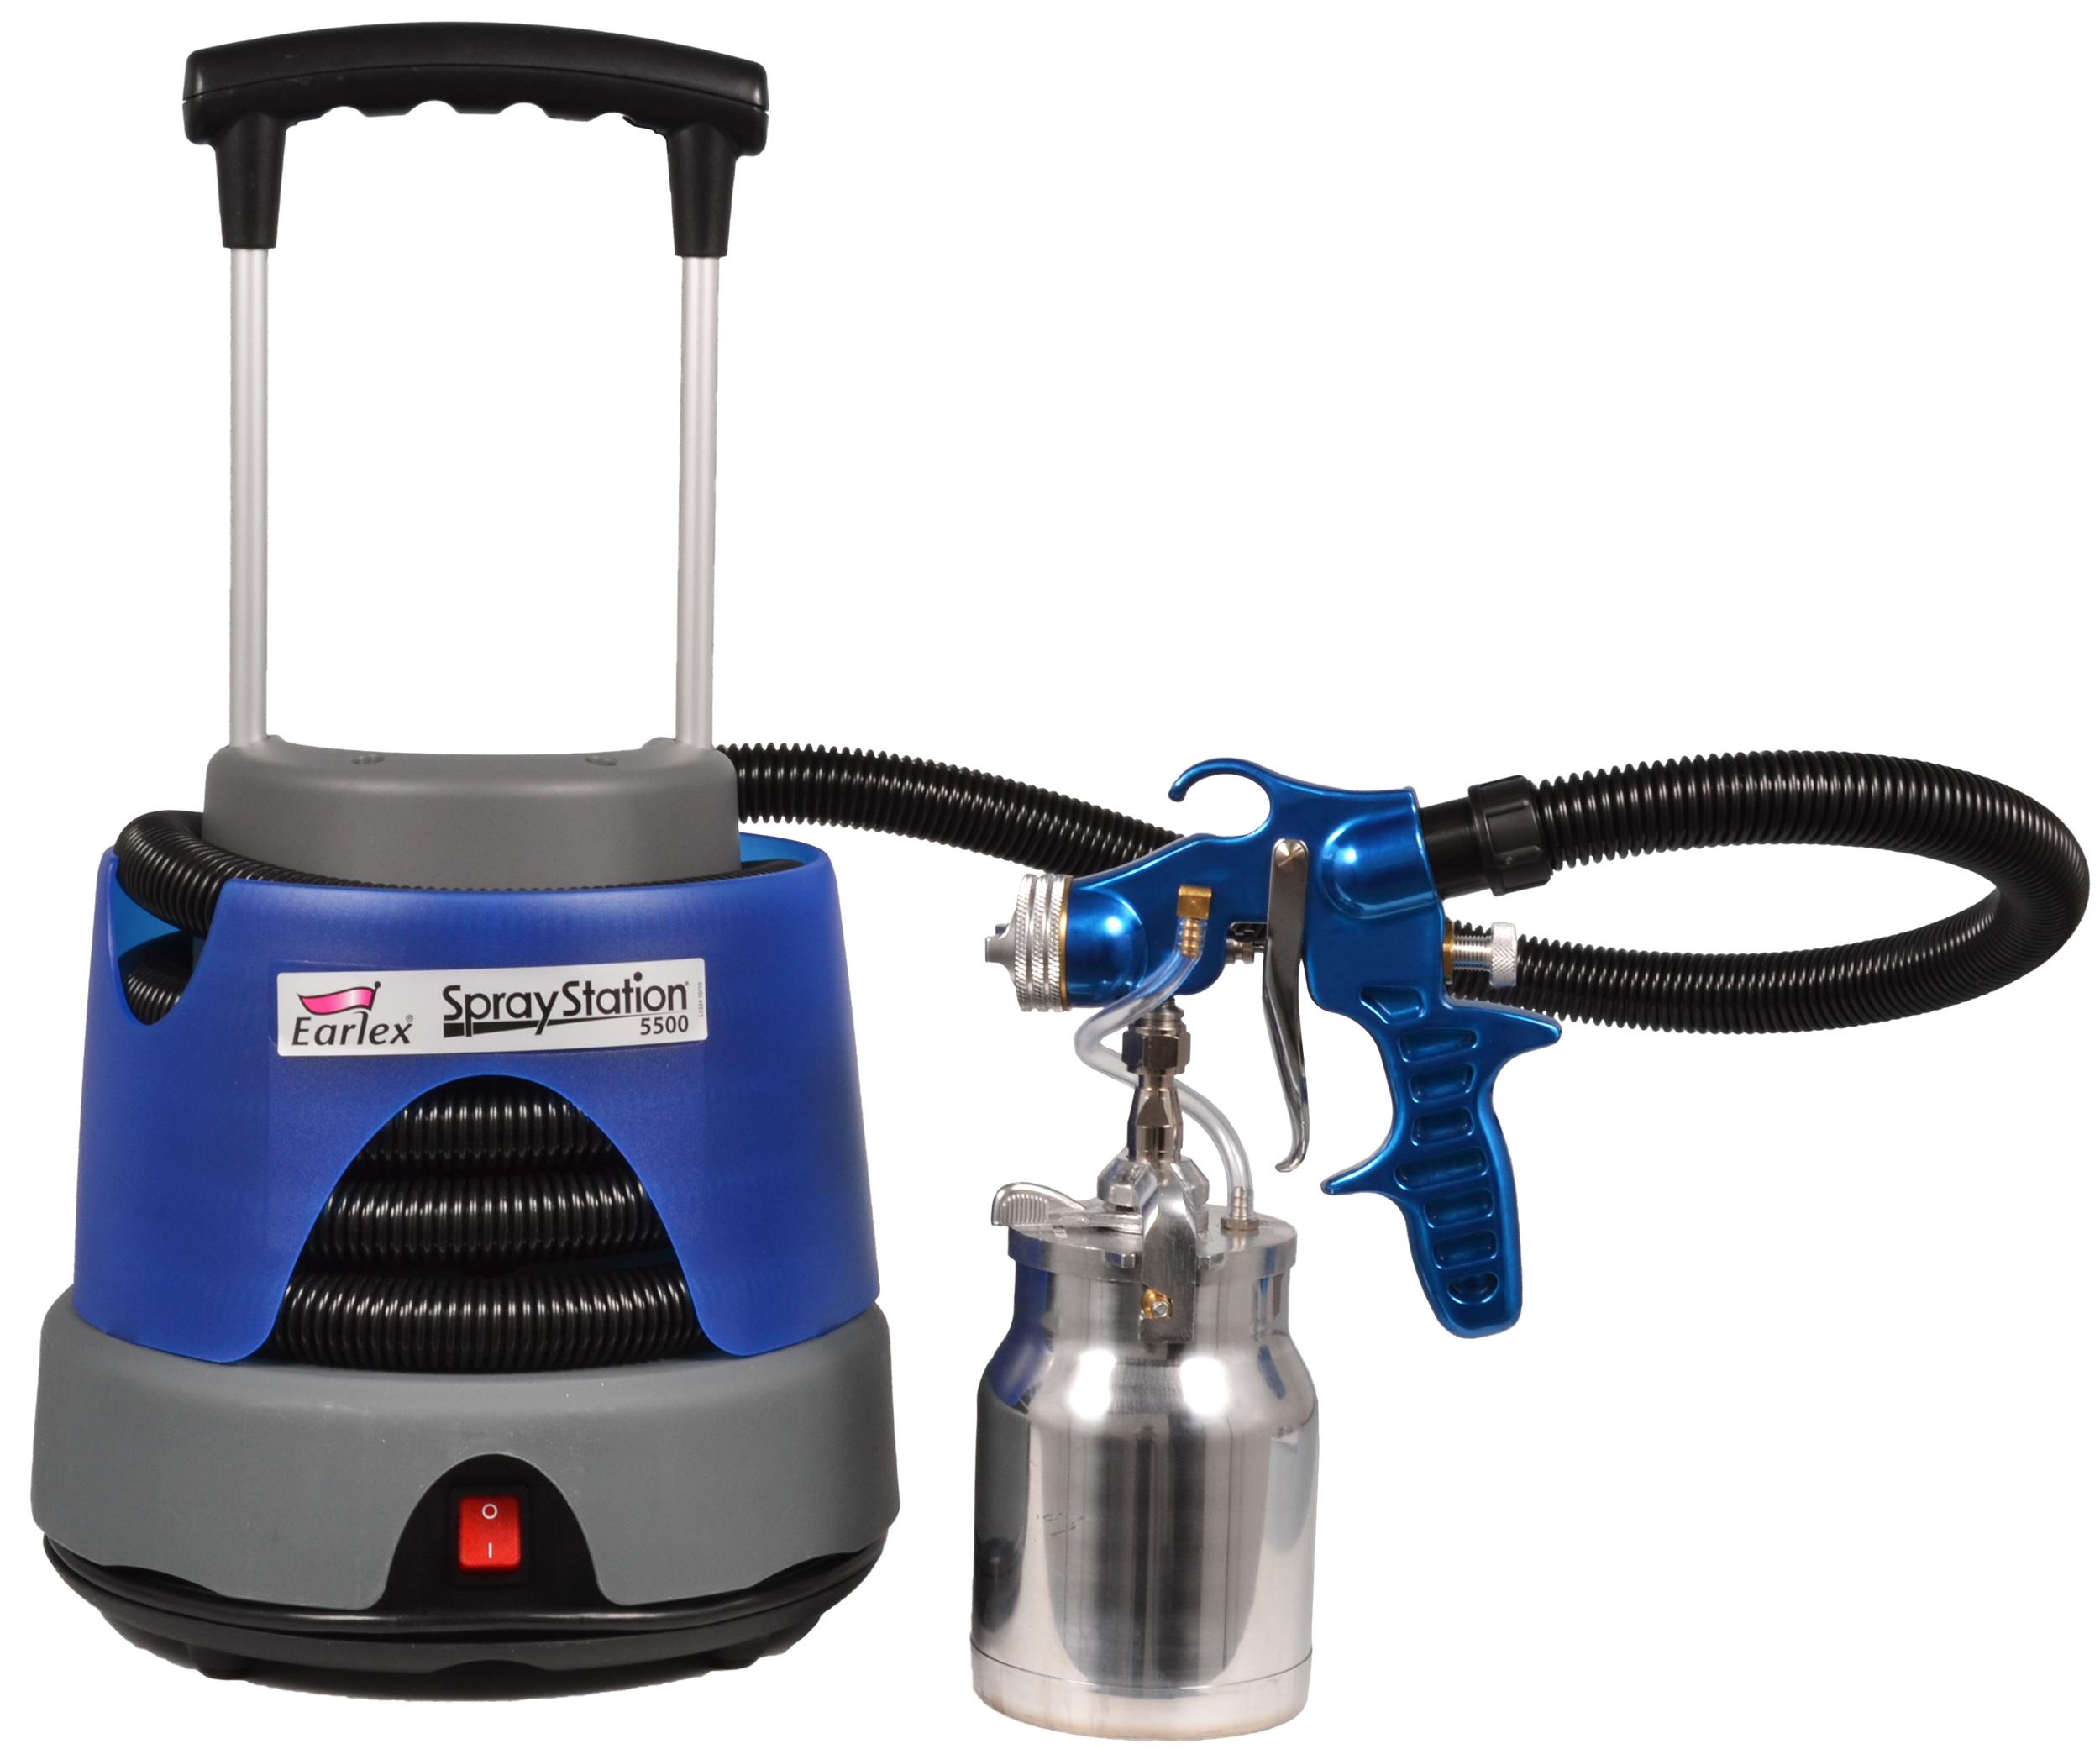 Earlex 5500 spray station pro construction forum be - Earlex spray station ...